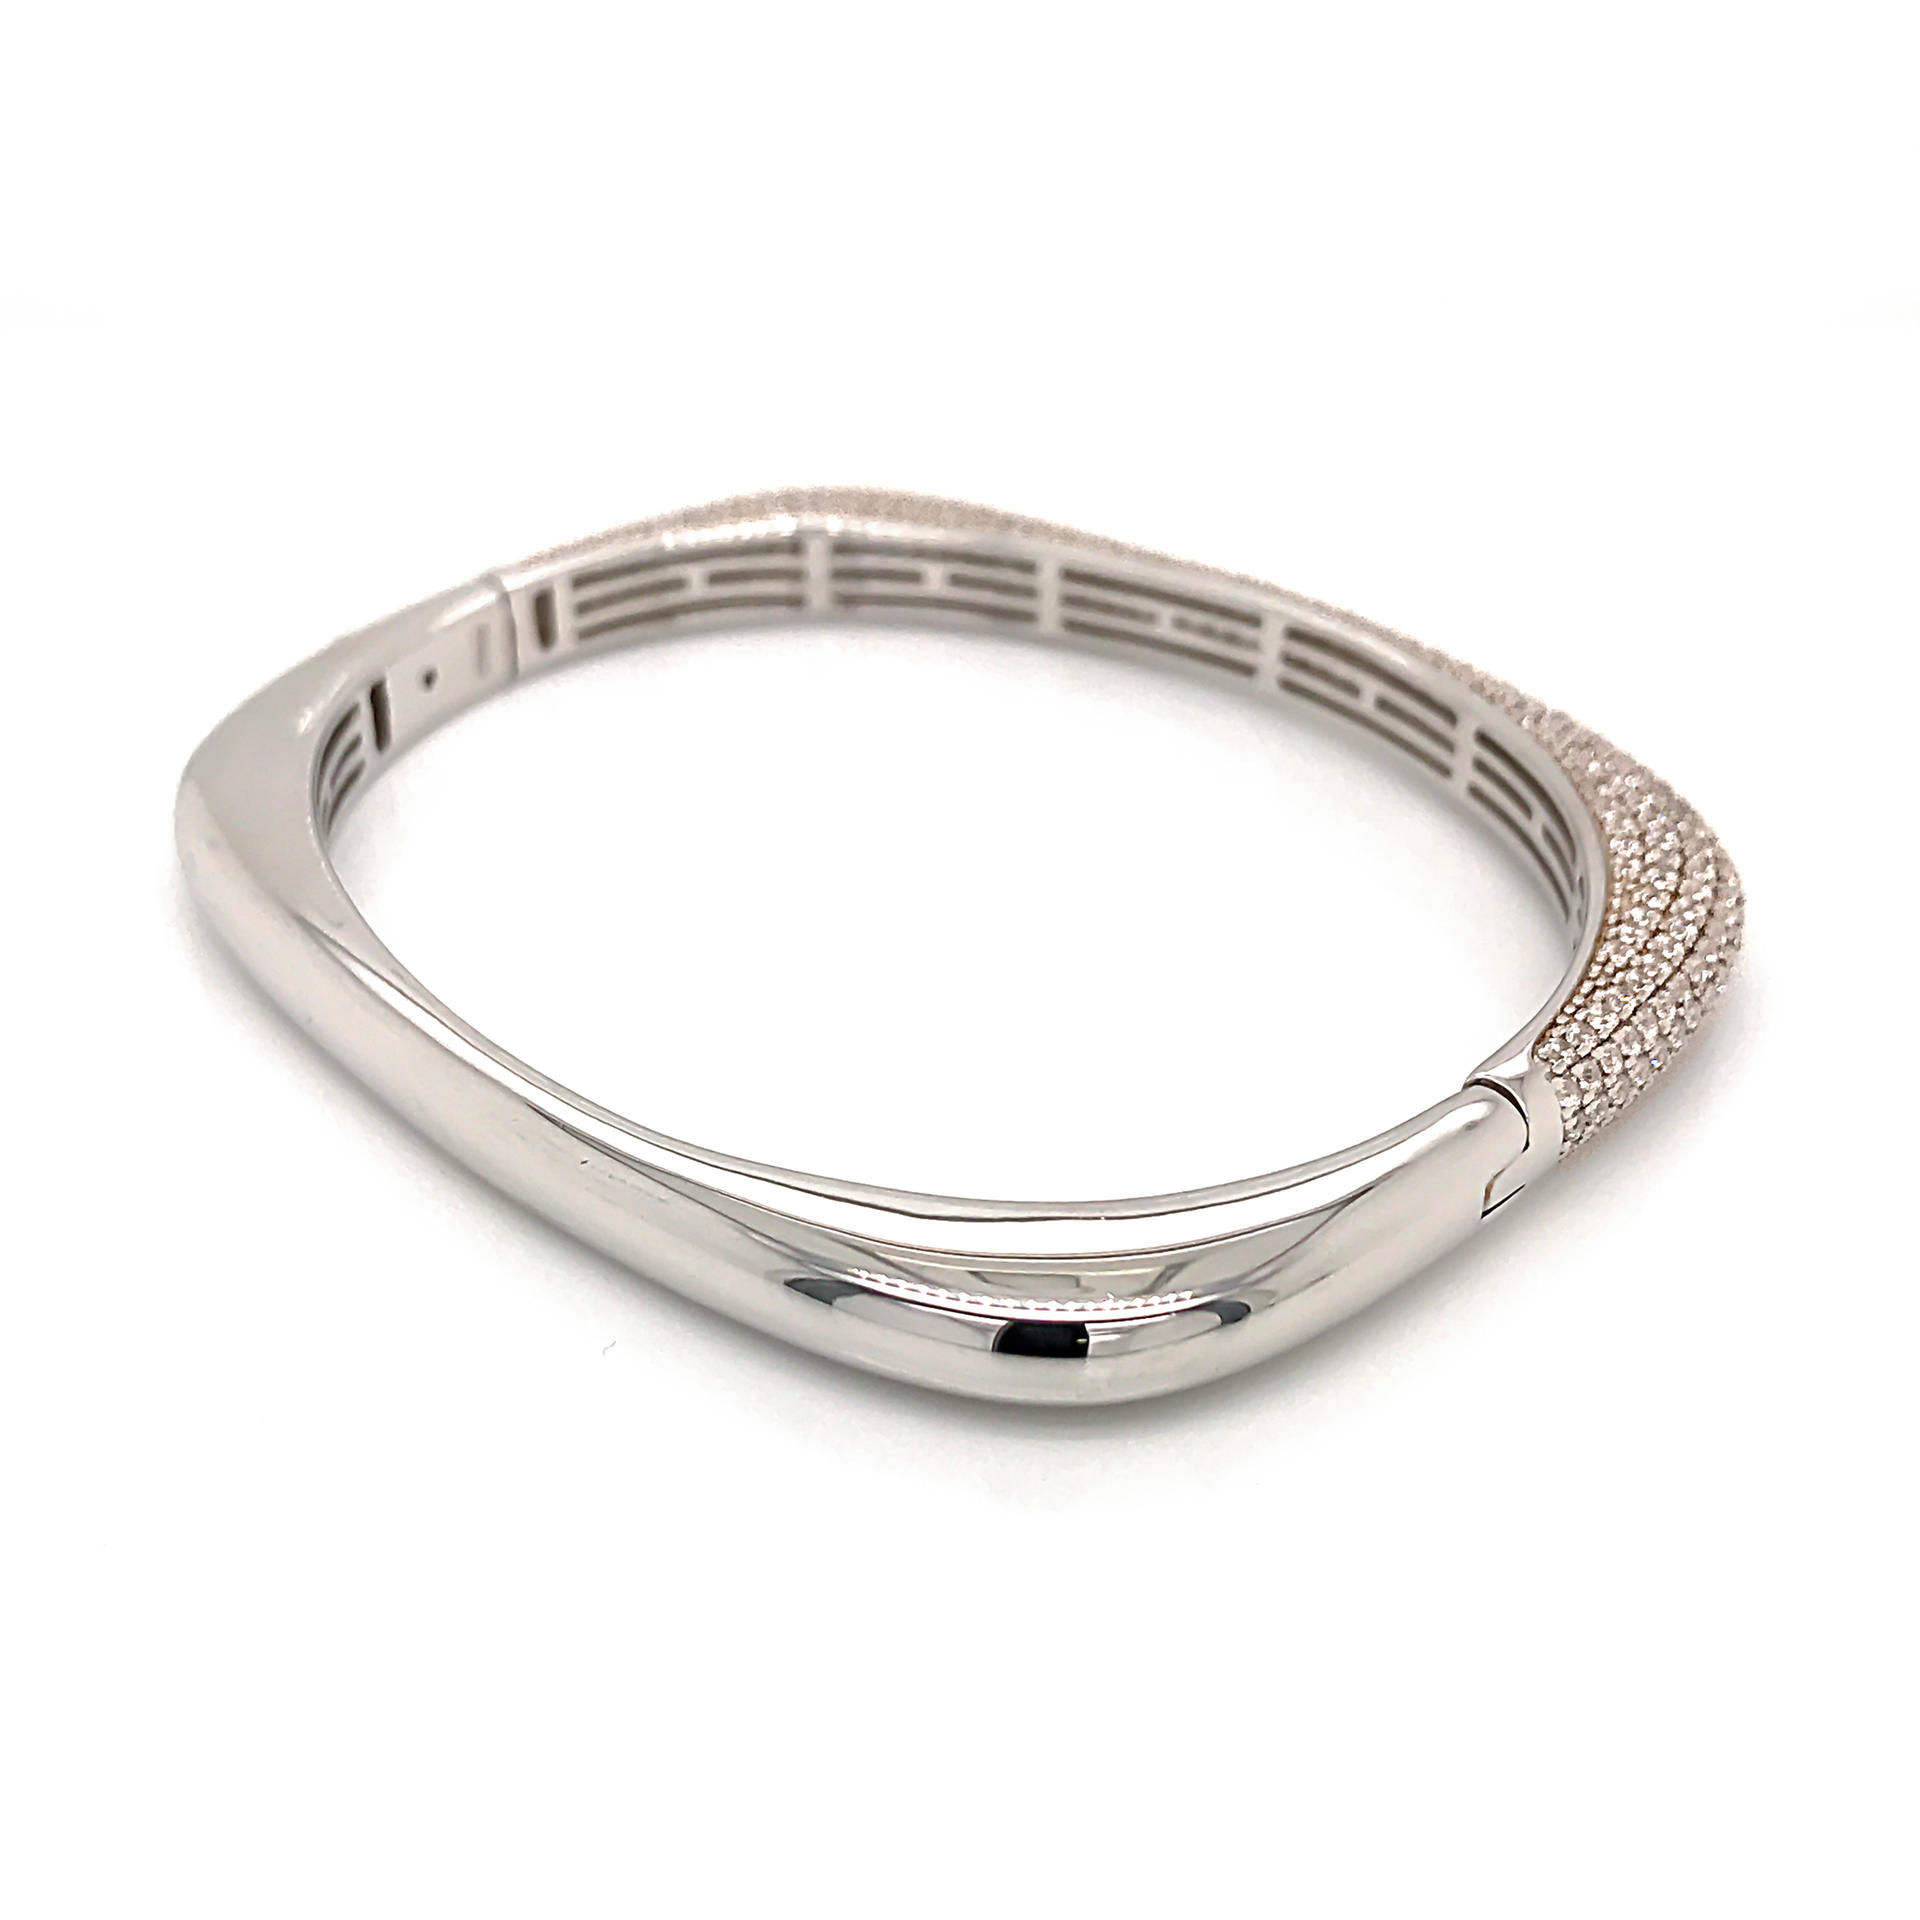 Luxury Zircon Half Pave Setting Geometric Silver Bangle Bracelet